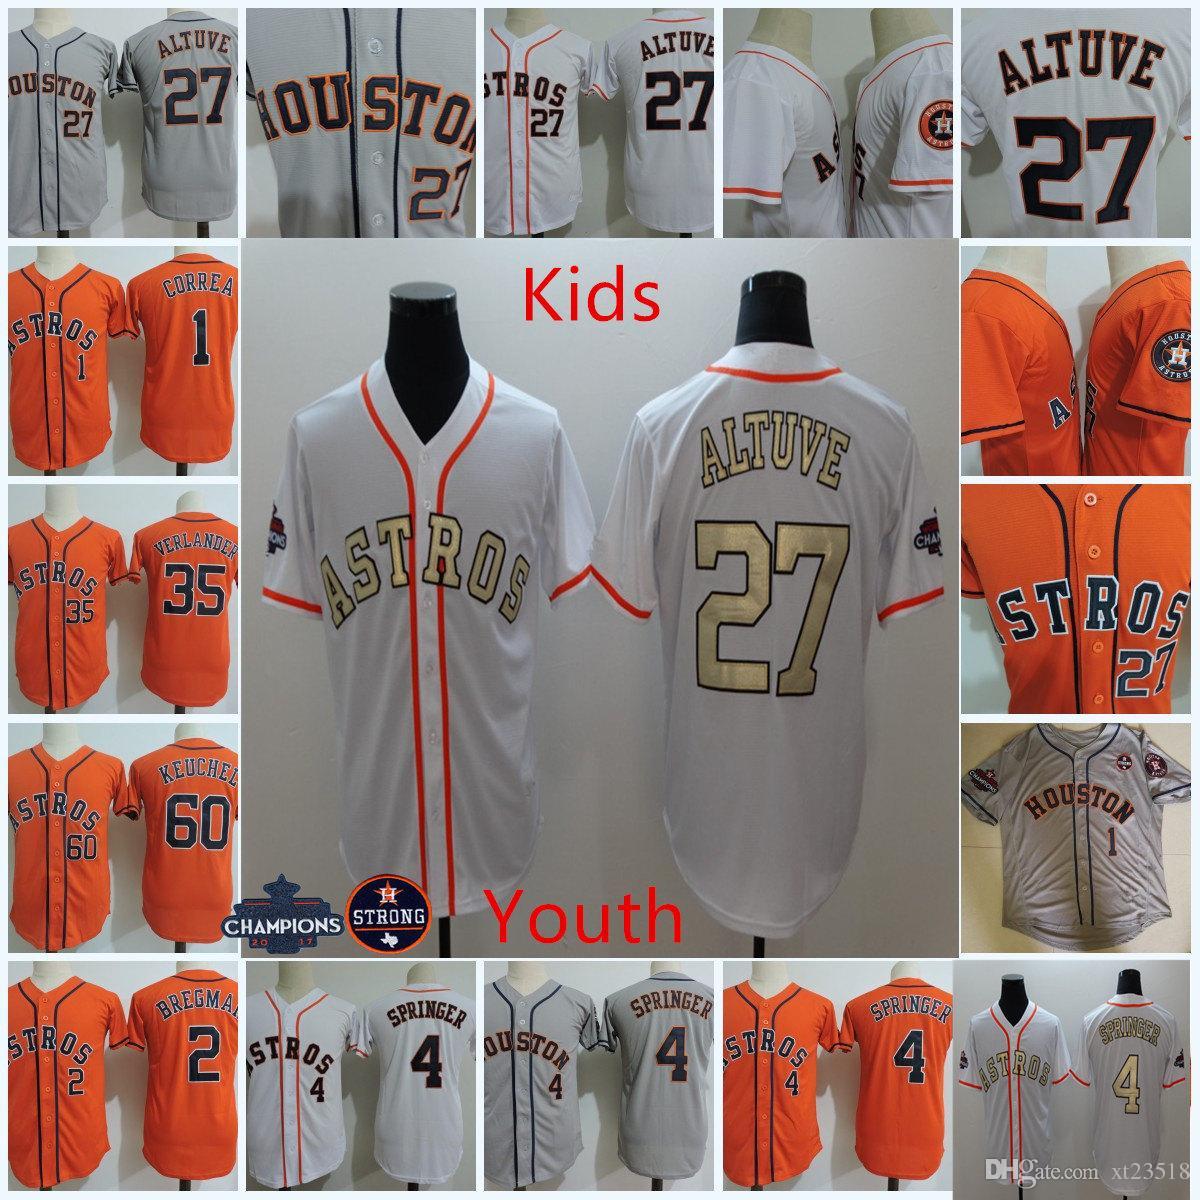 timeless design 70bbe 35112 Youth #4 George Springer Jersey Kids #1 Carlos Correa #2 Alex Bregman #35  Justin Verlander #27 Jose Altuve Jersey S-3XL